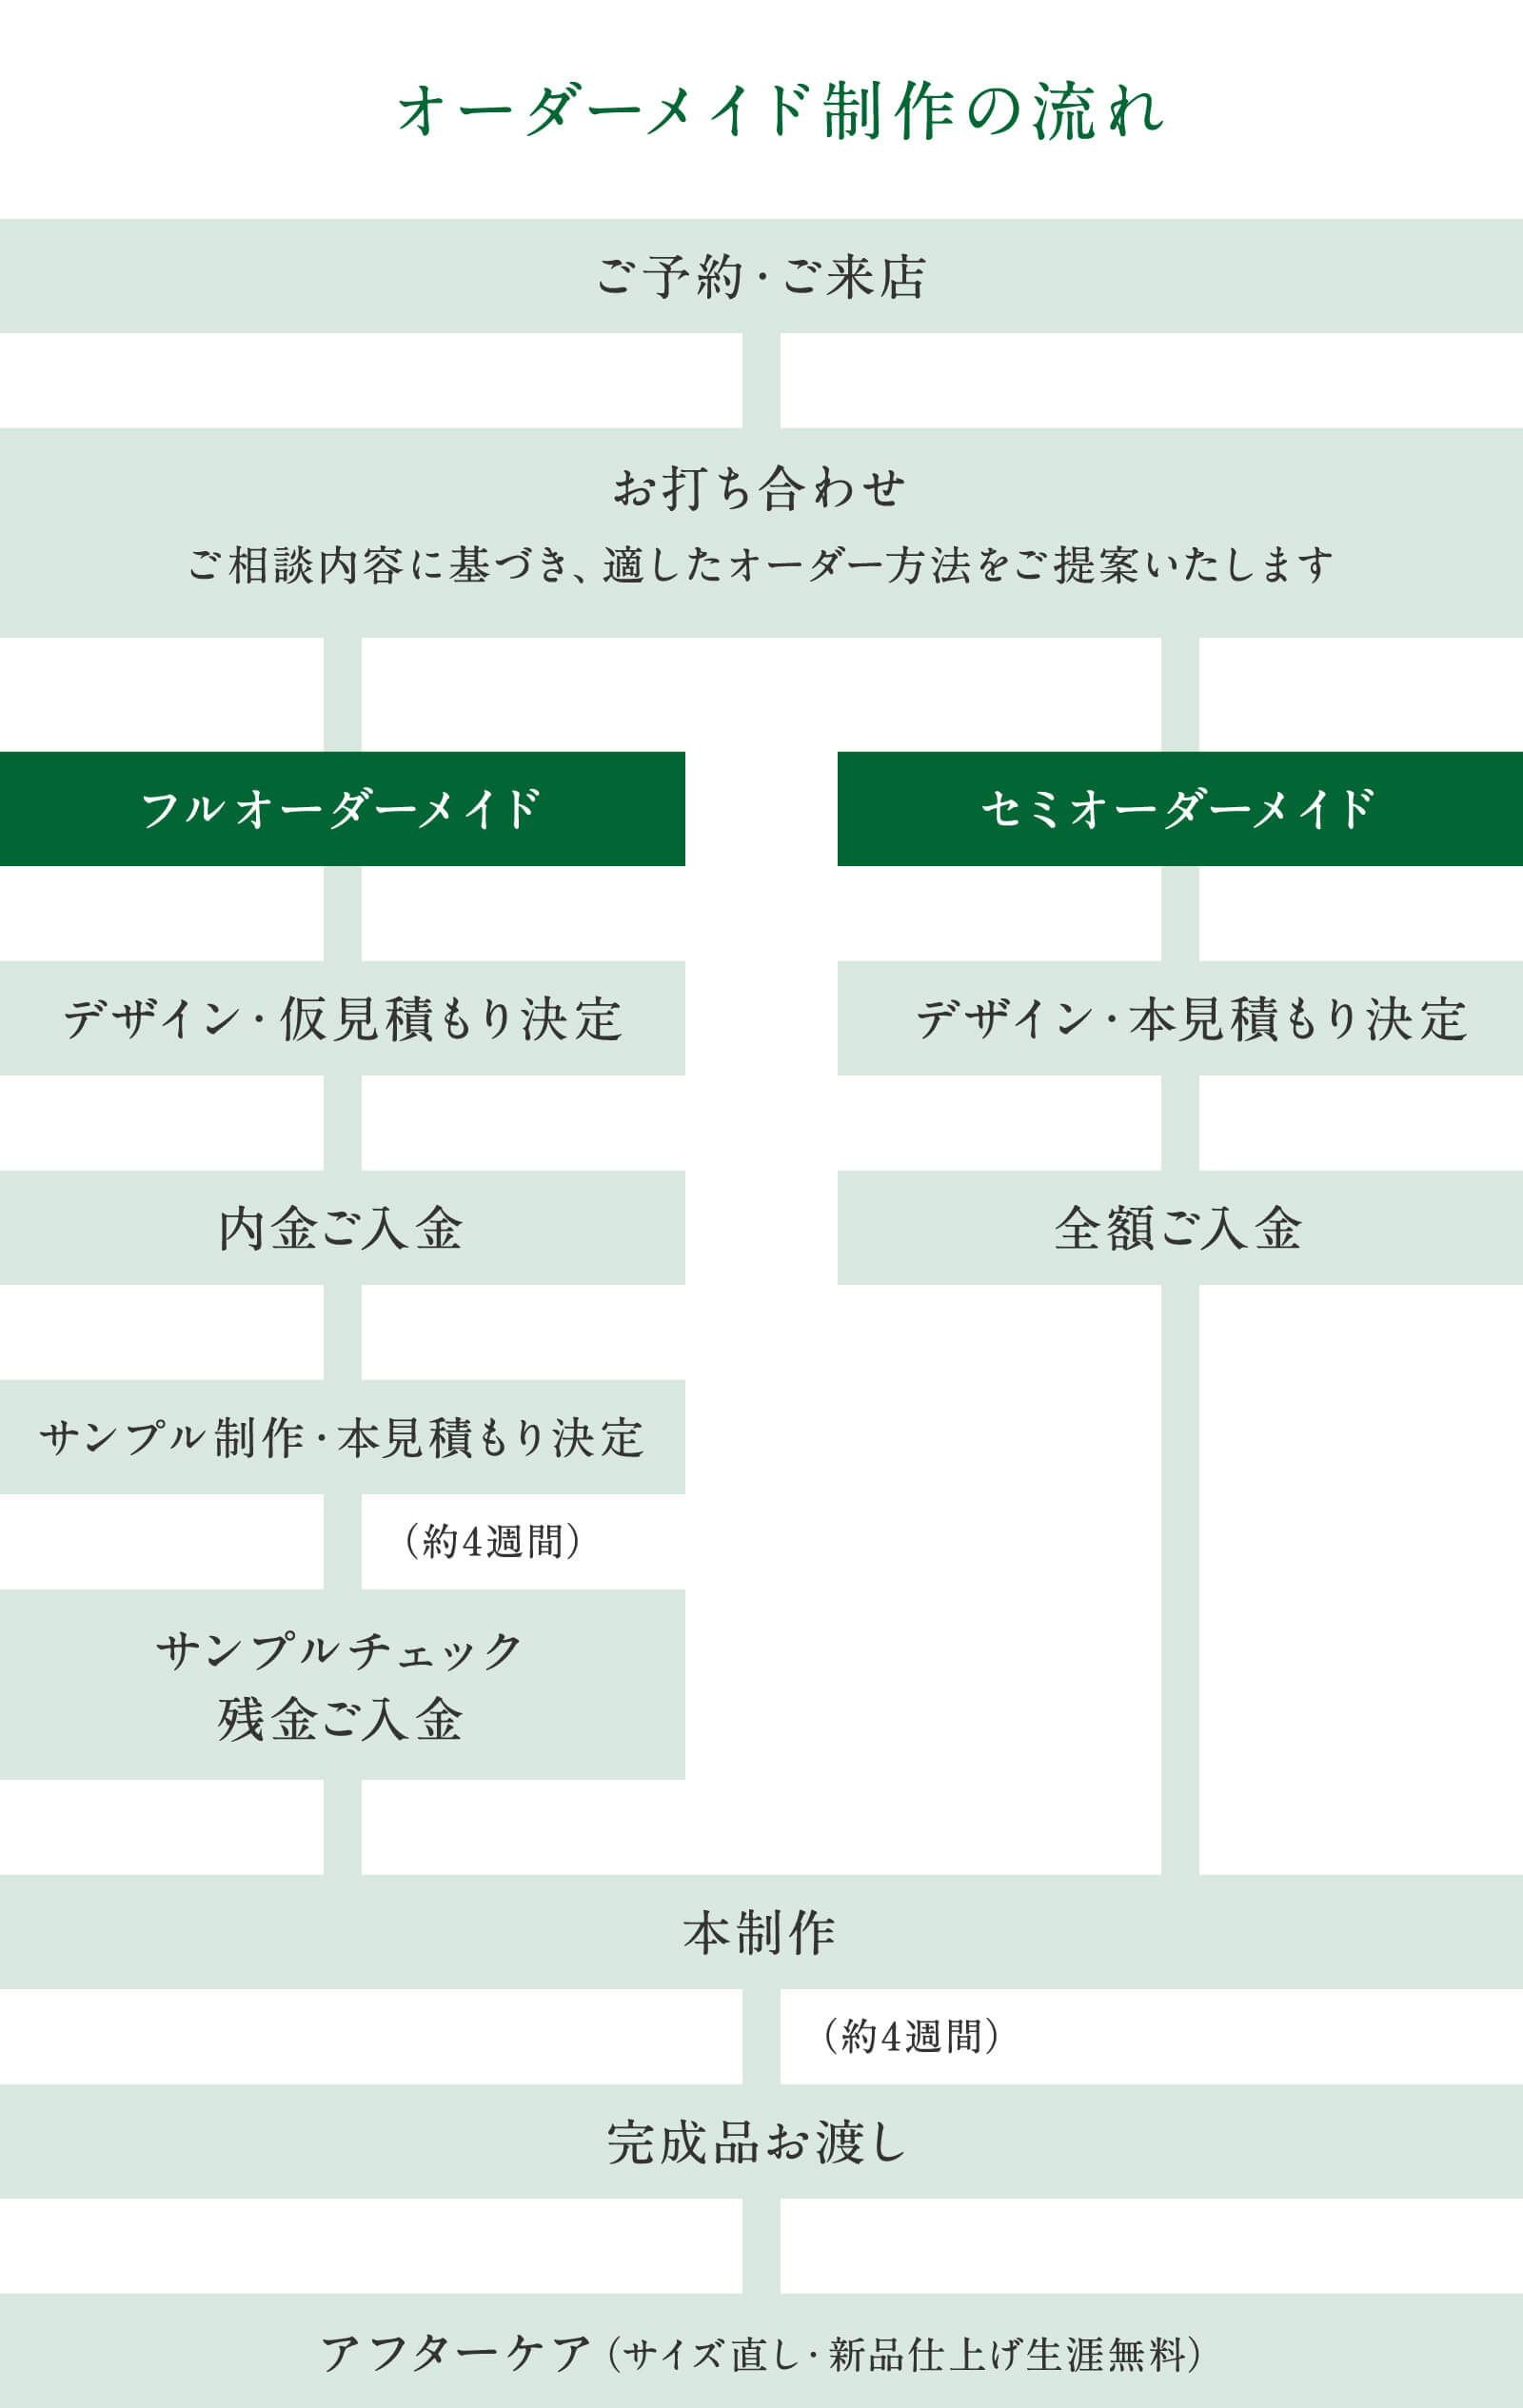 hitotsuchi_img